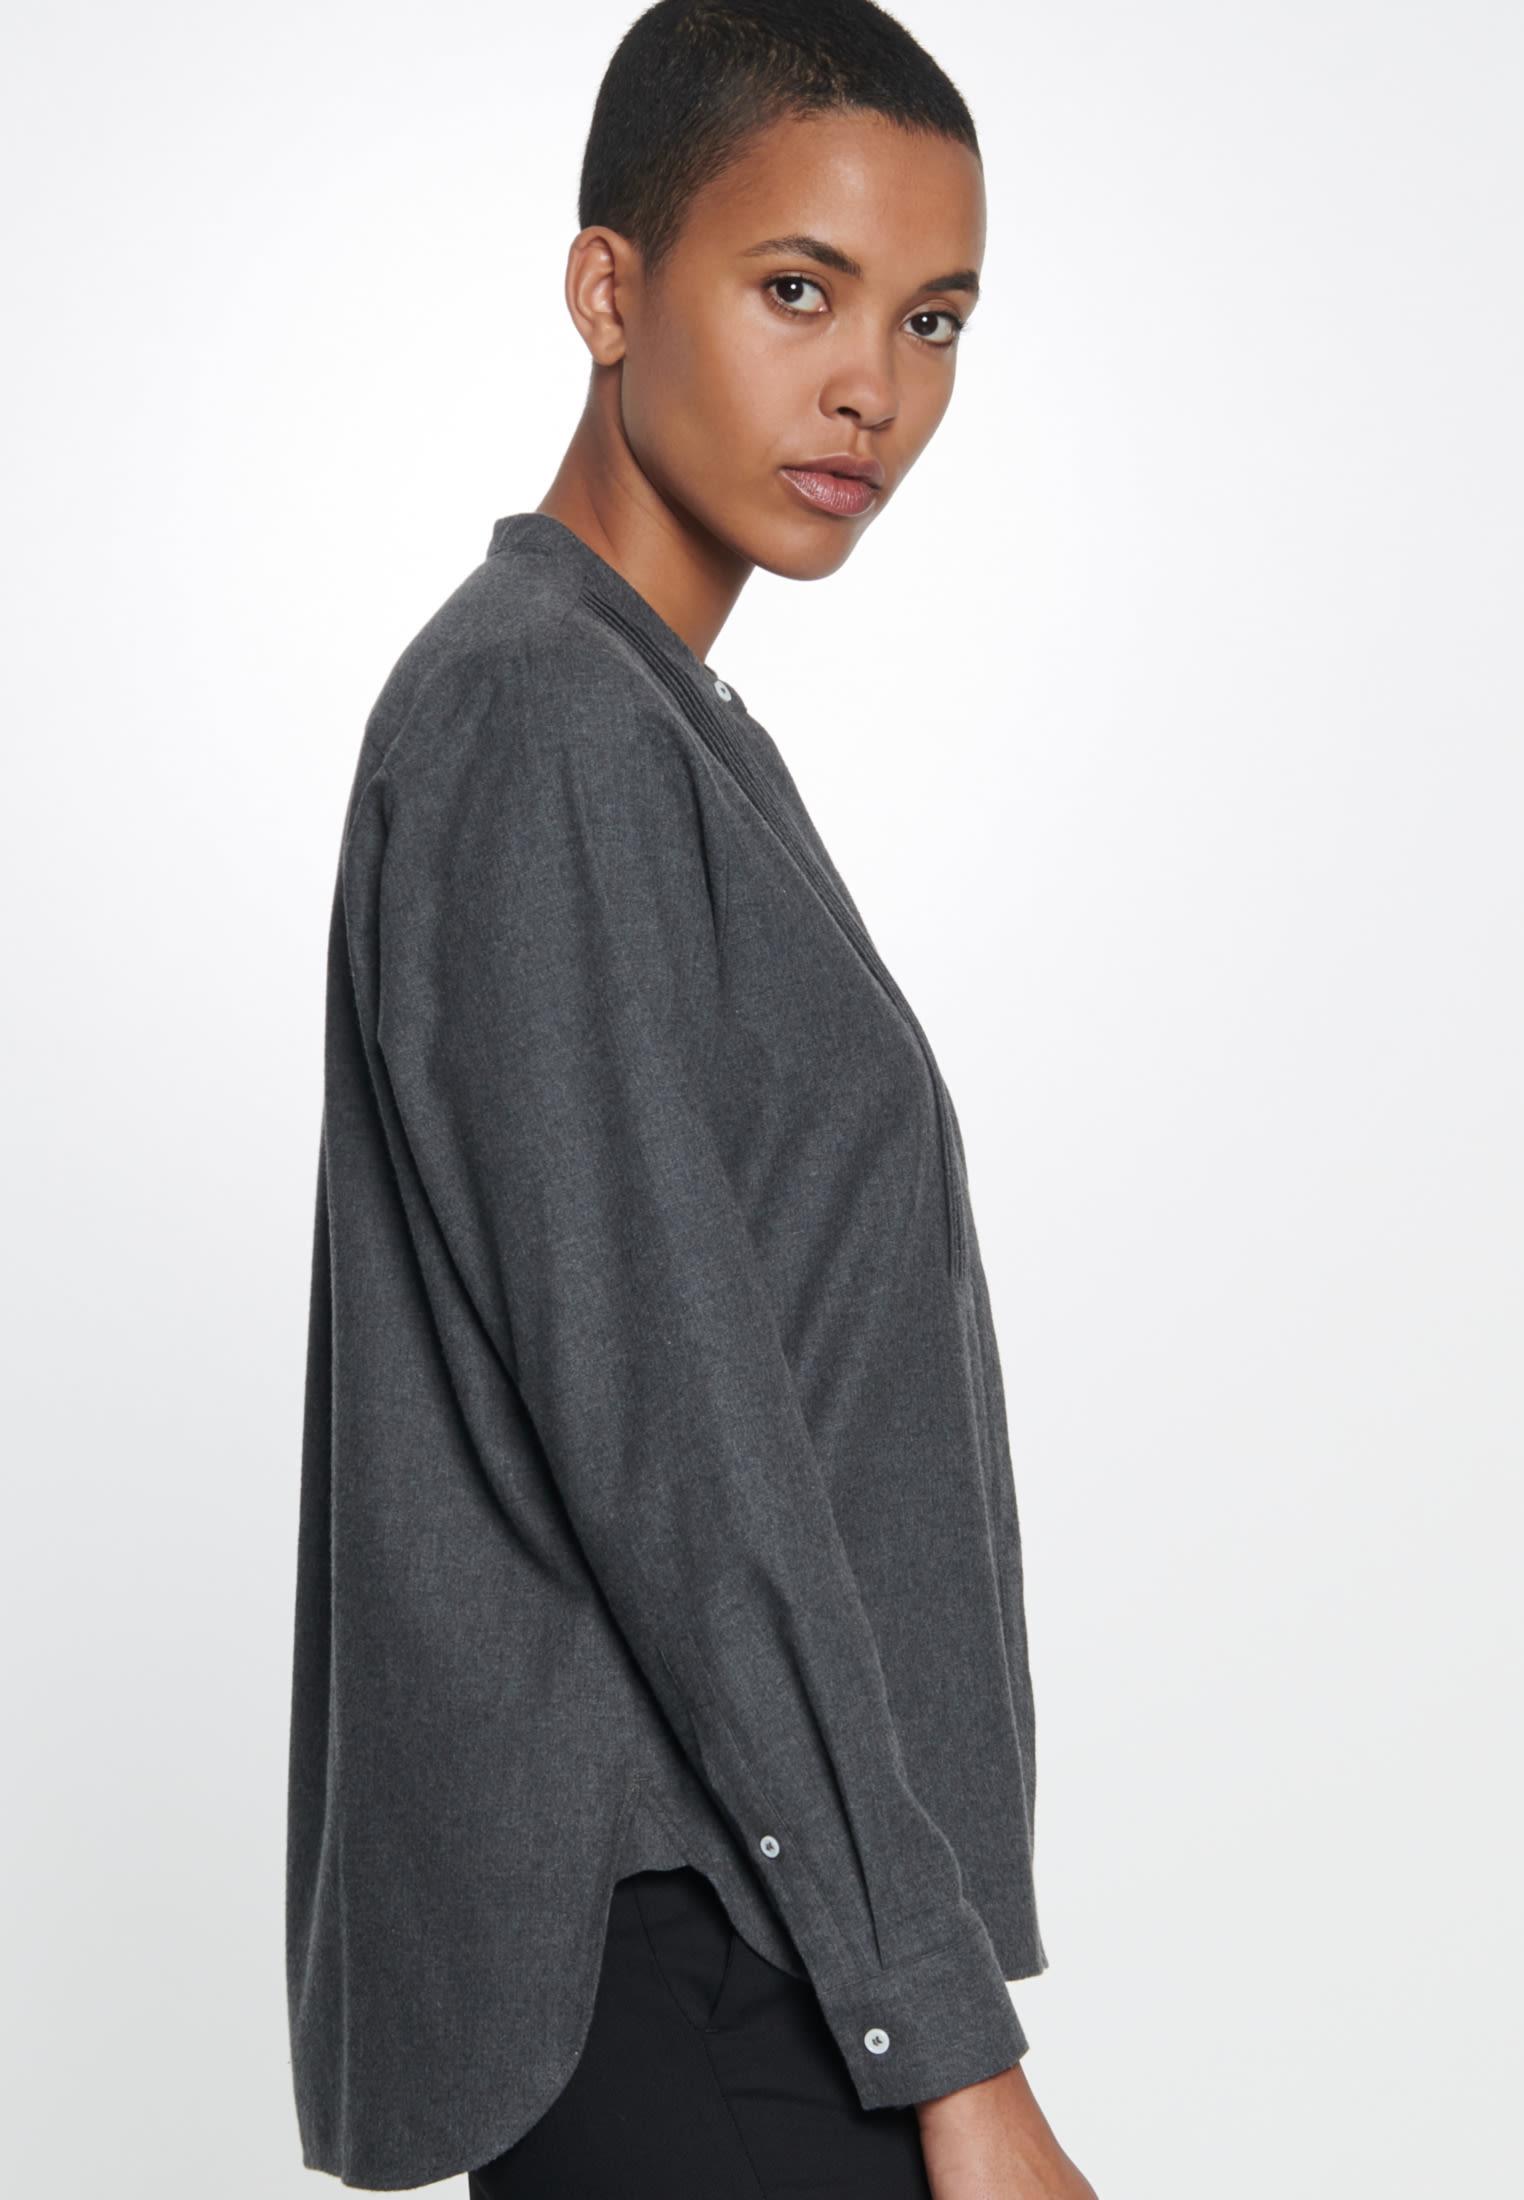 Flannel Stand-Up Blouse made of 100% Cotton in dunkelgrau |  Seidensticker Onlineshop